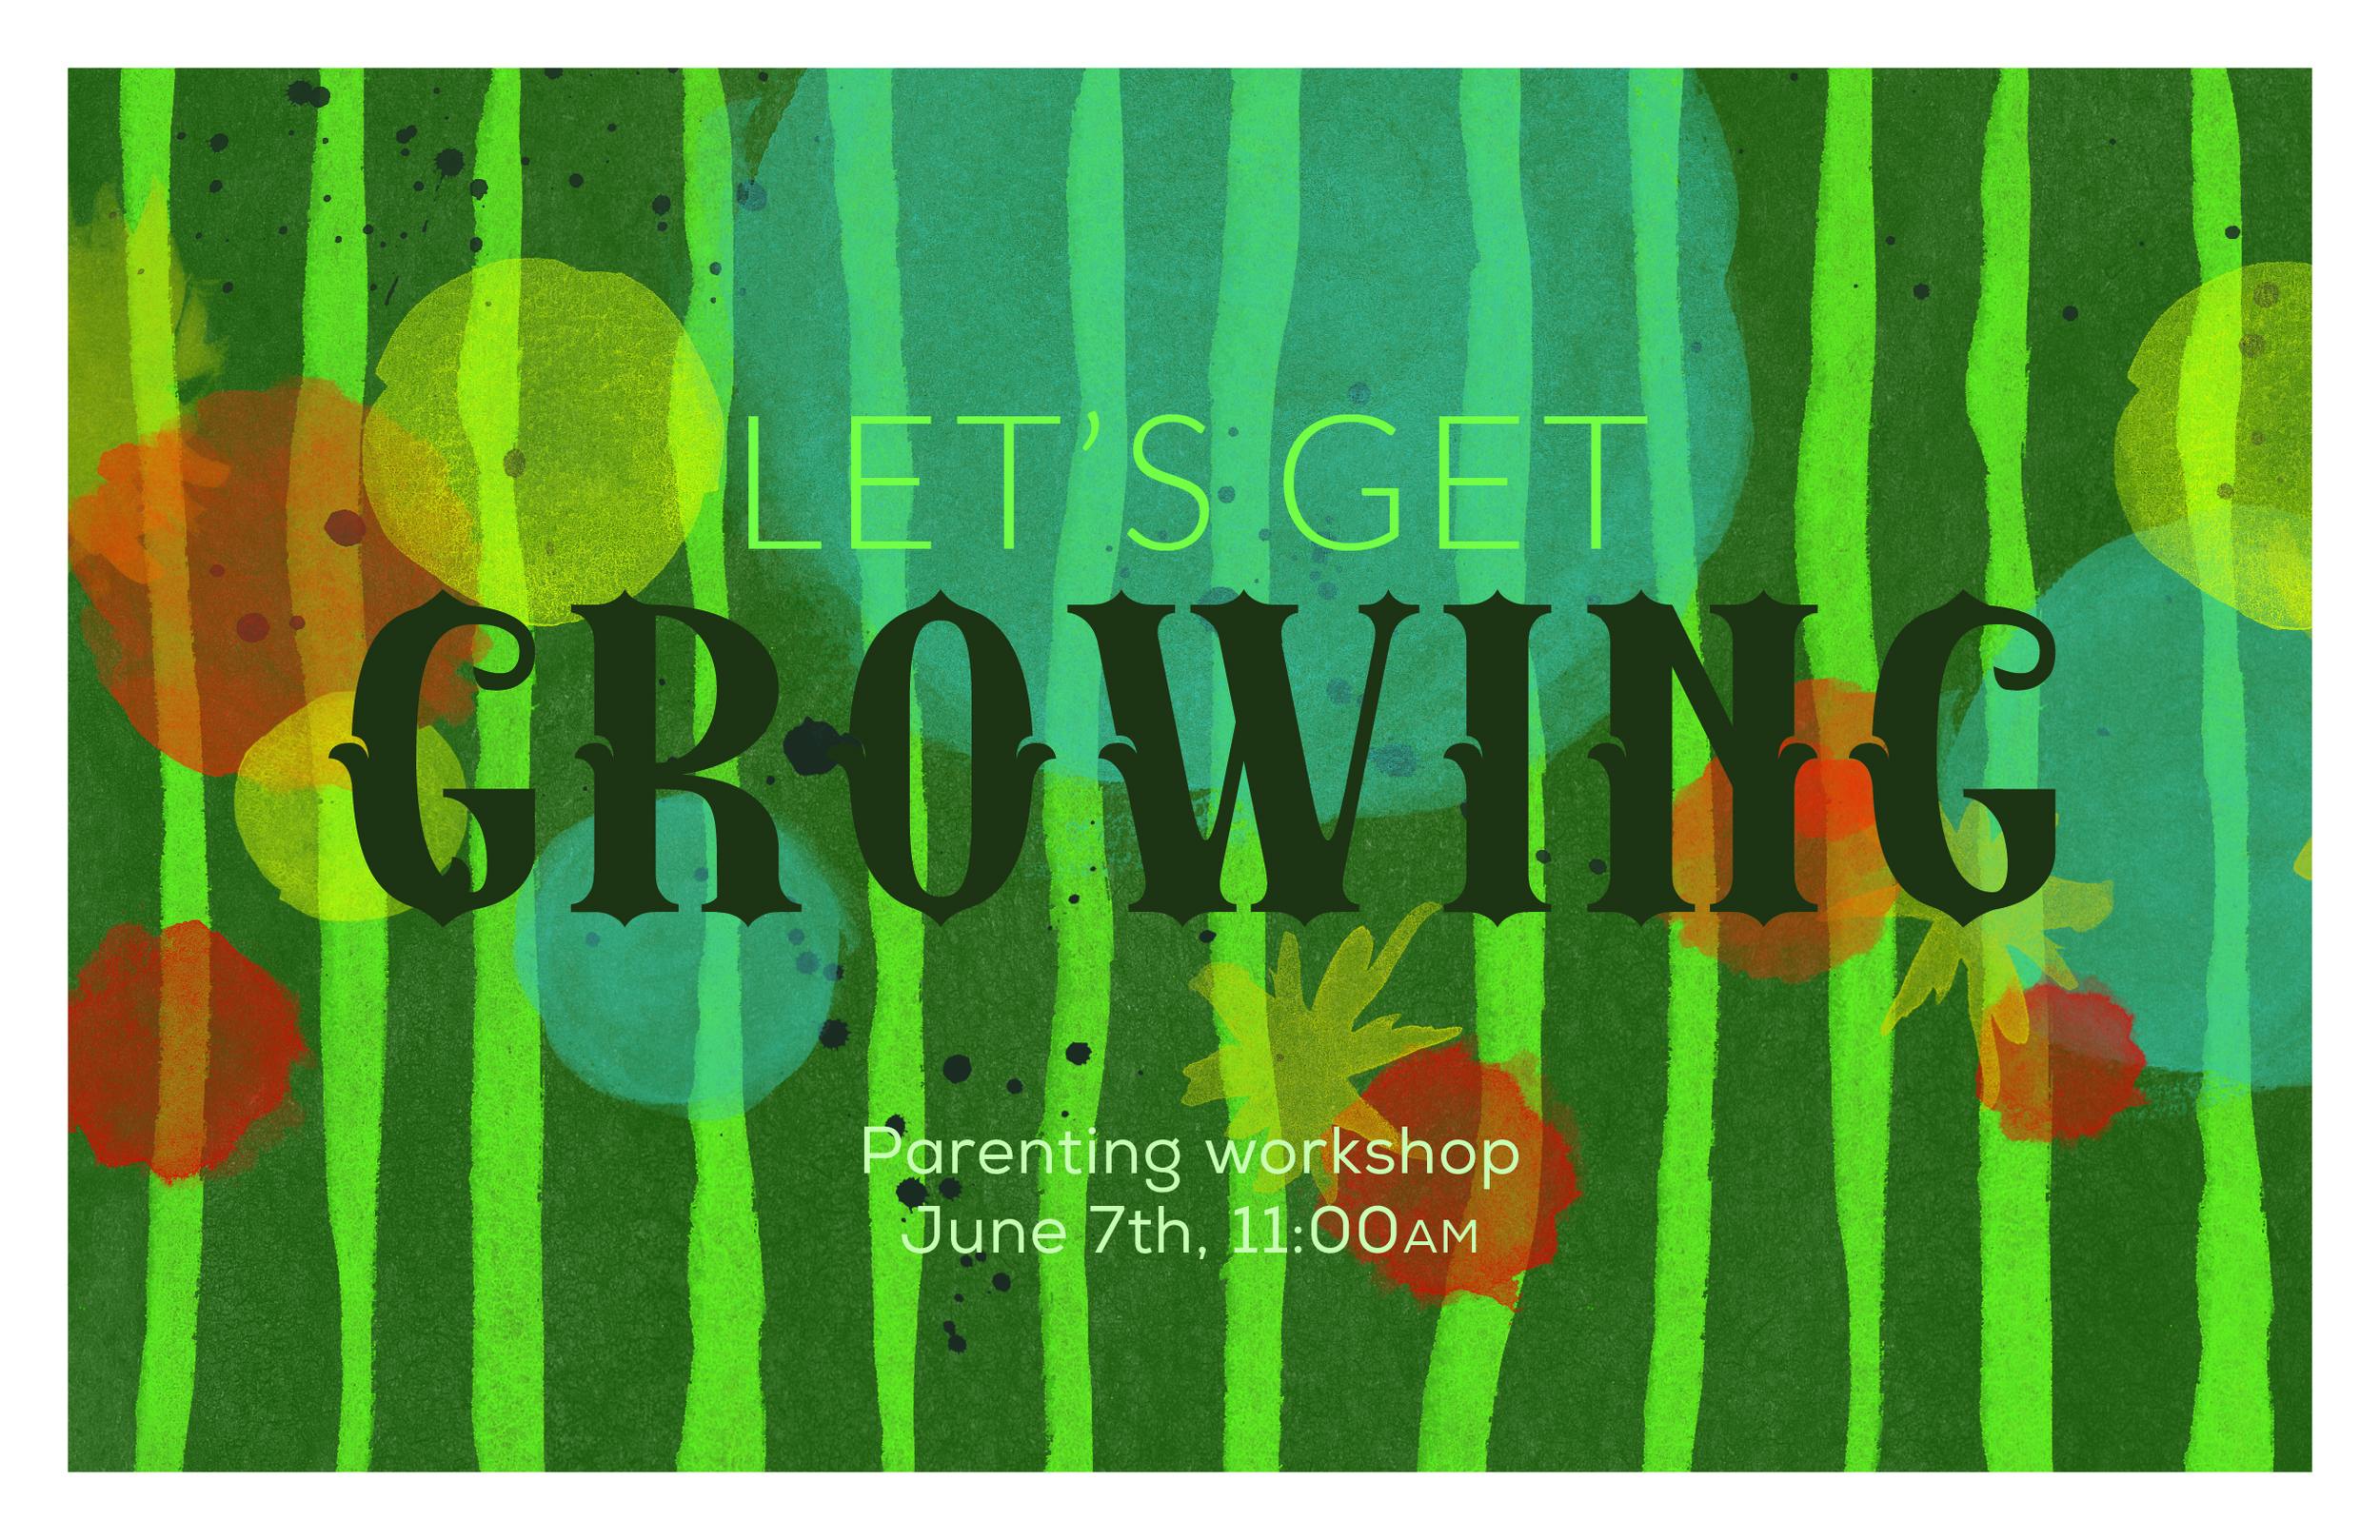 LetsGetGrowing